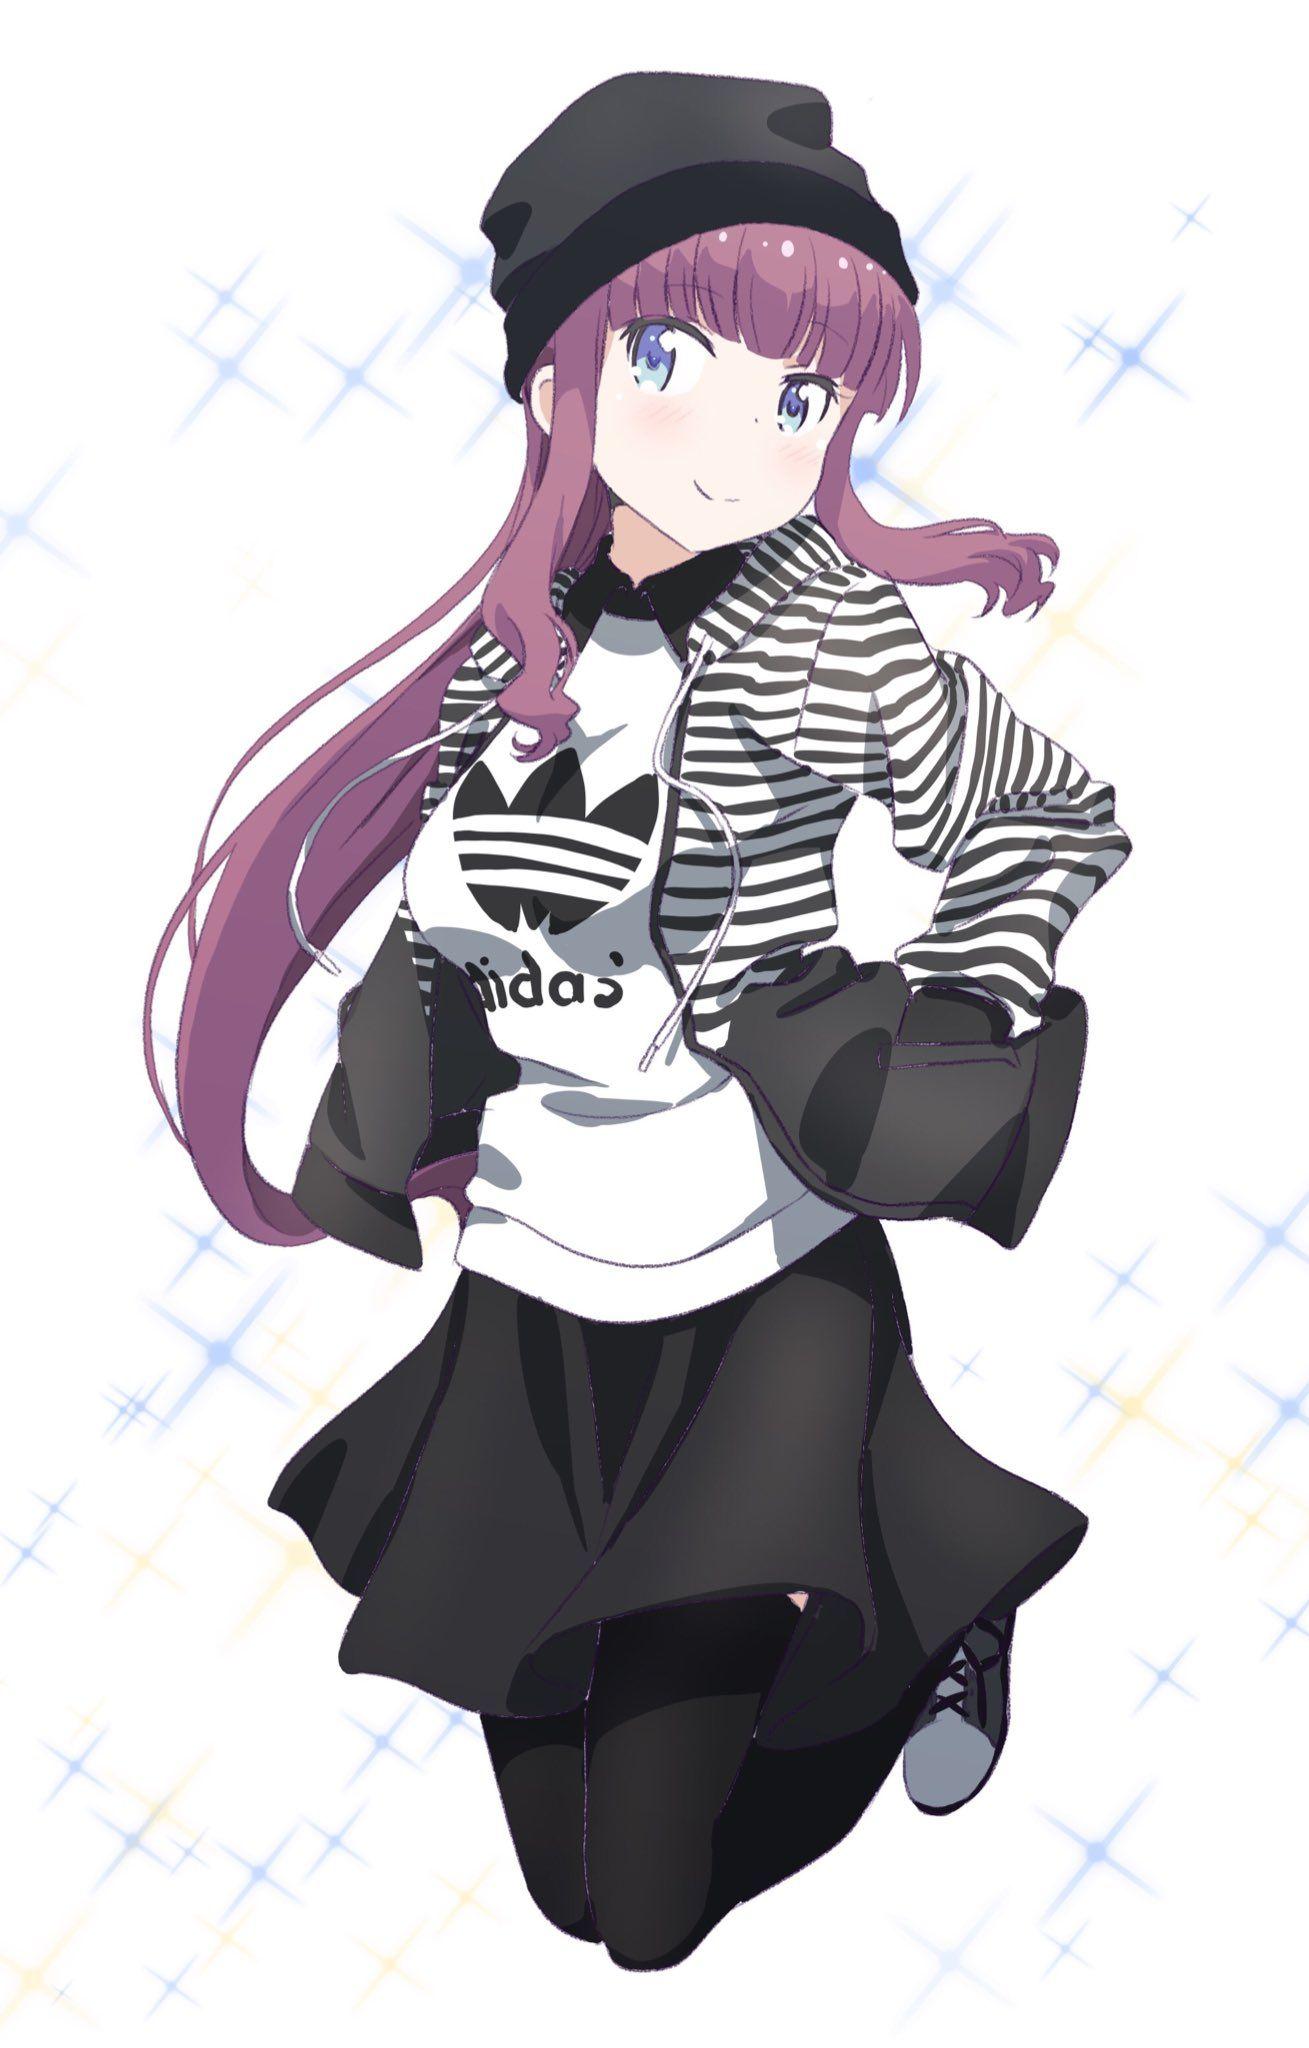 Sooohl 画像あり かわいいアニメガール アニメスタイル 美しい